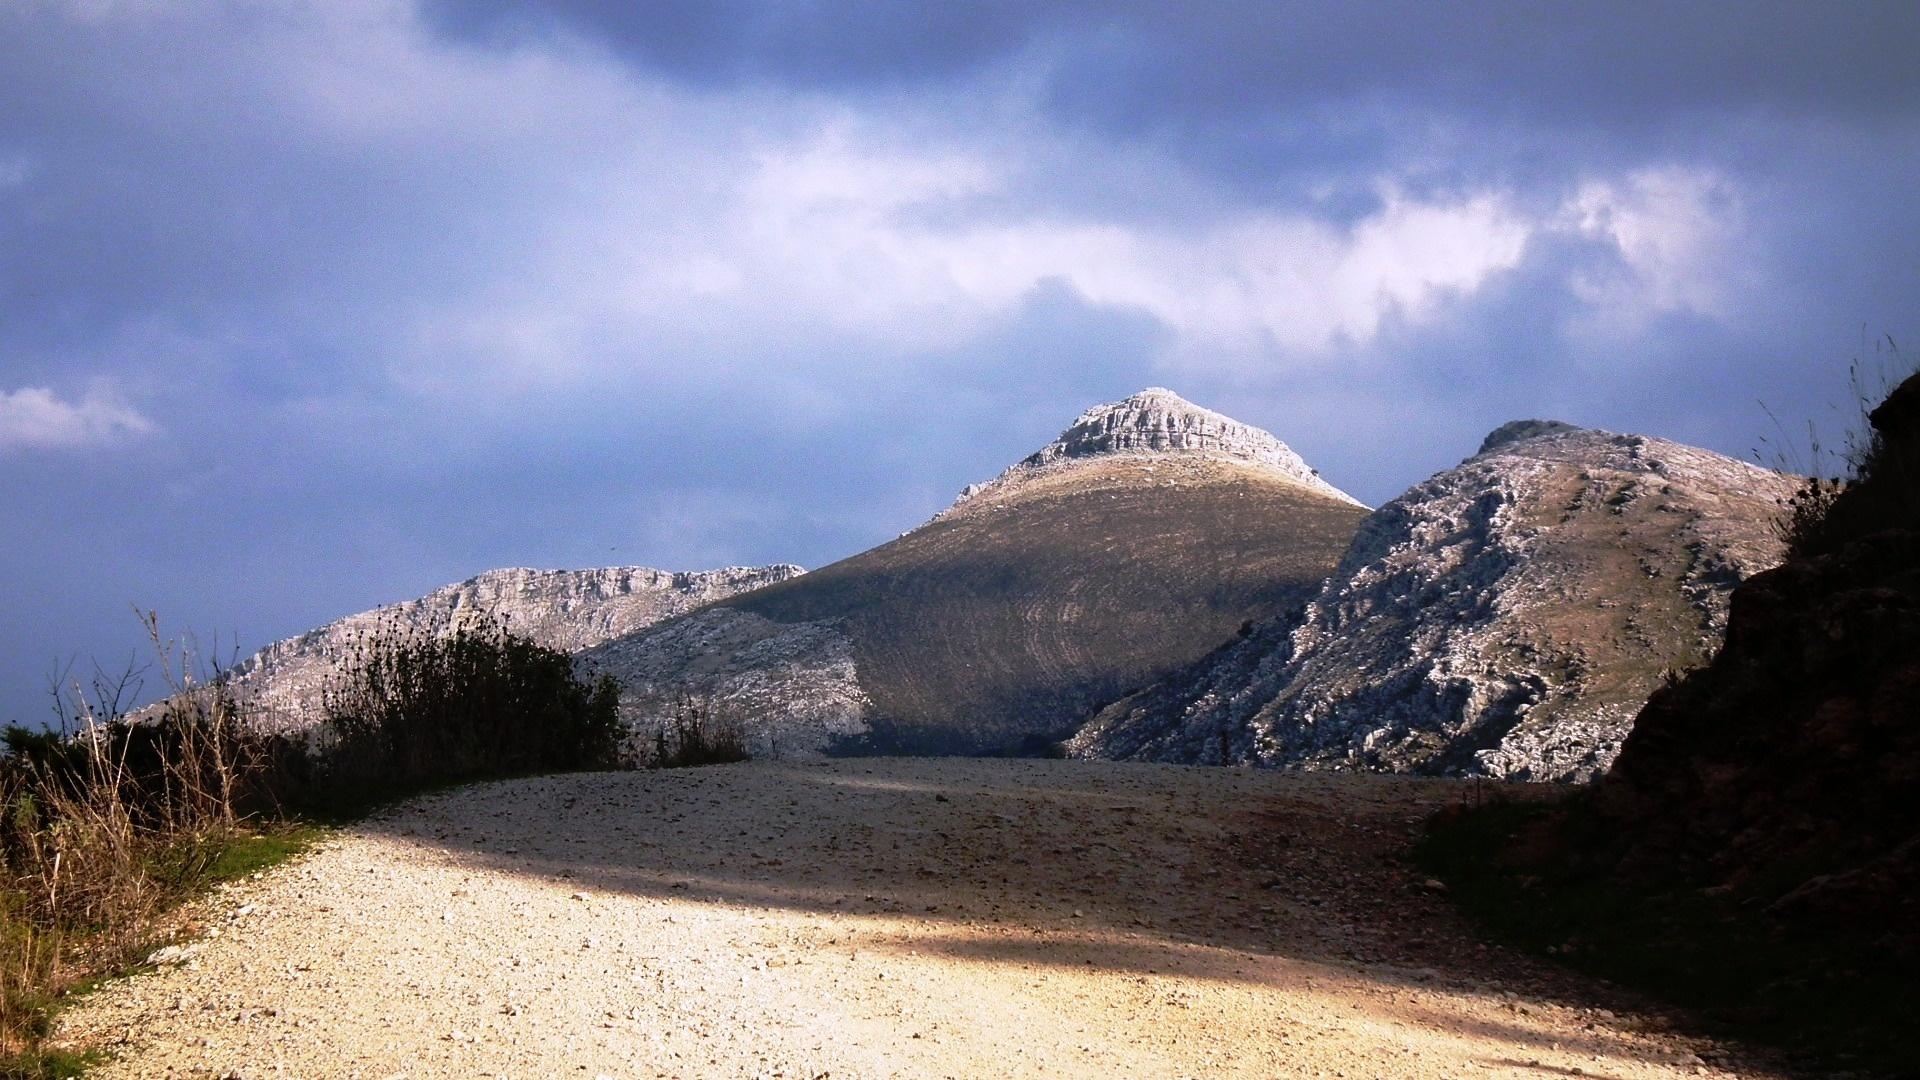 Pico de la Capilla by Peter Rowland